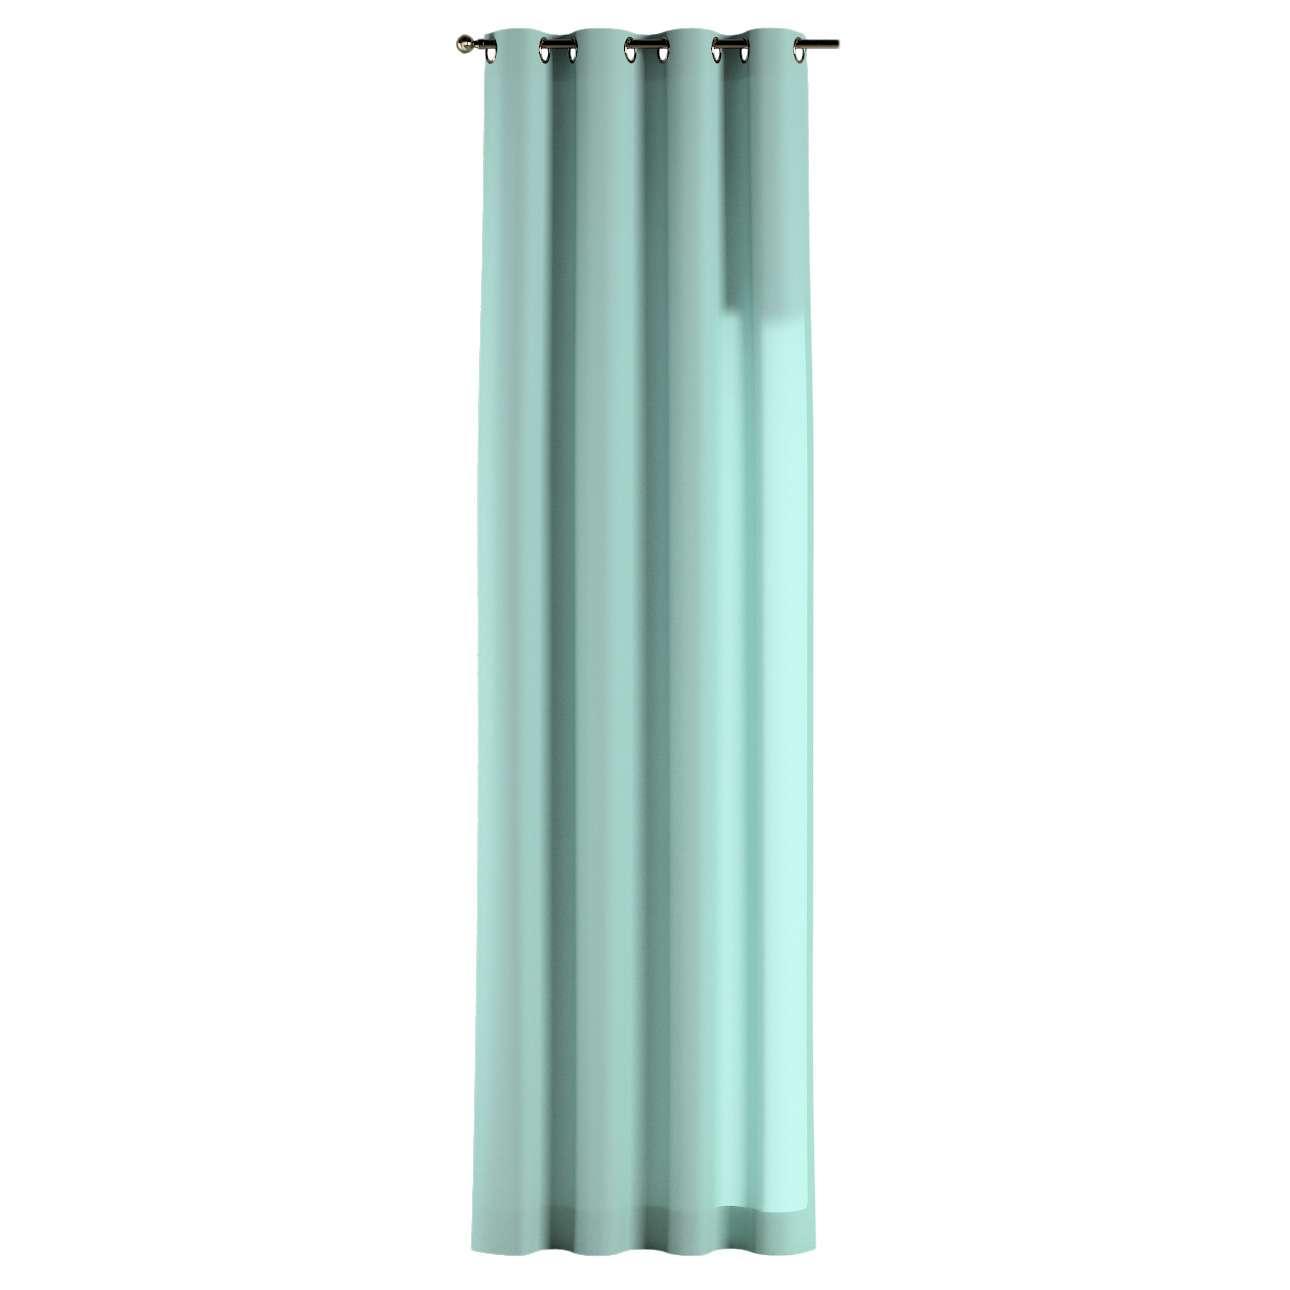 Záves s kolieskami 130 × 260 cm V kolekcii Loneta, tkanina: 133-32